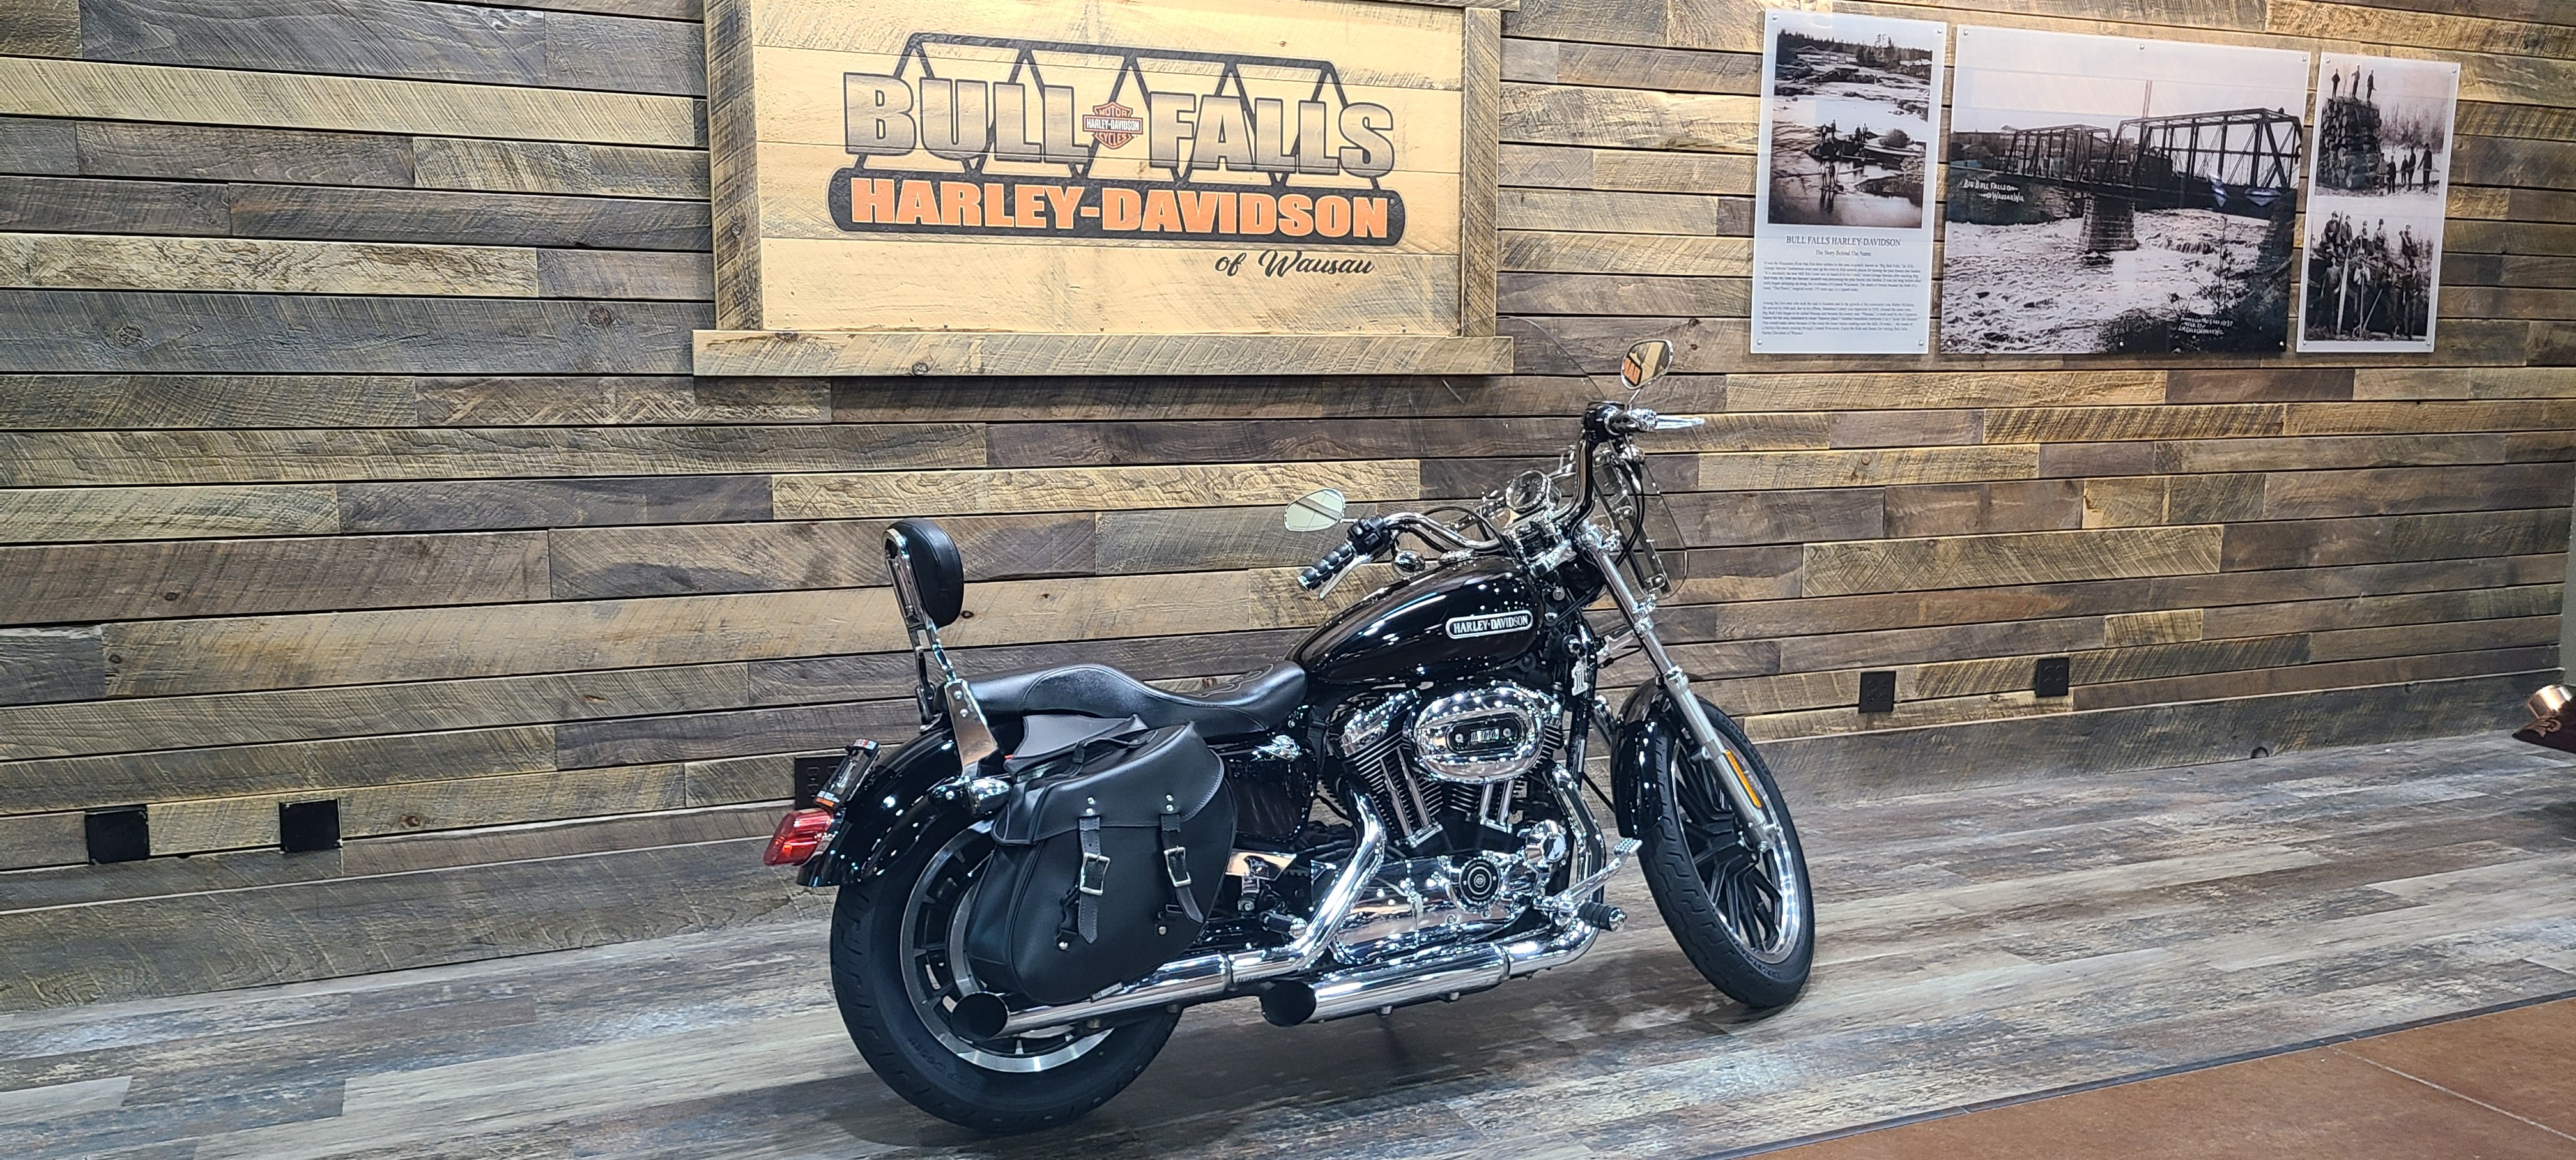 2007 Harley-Davidson Sportster 1200 Low at Bull Falls Harley-Davidson